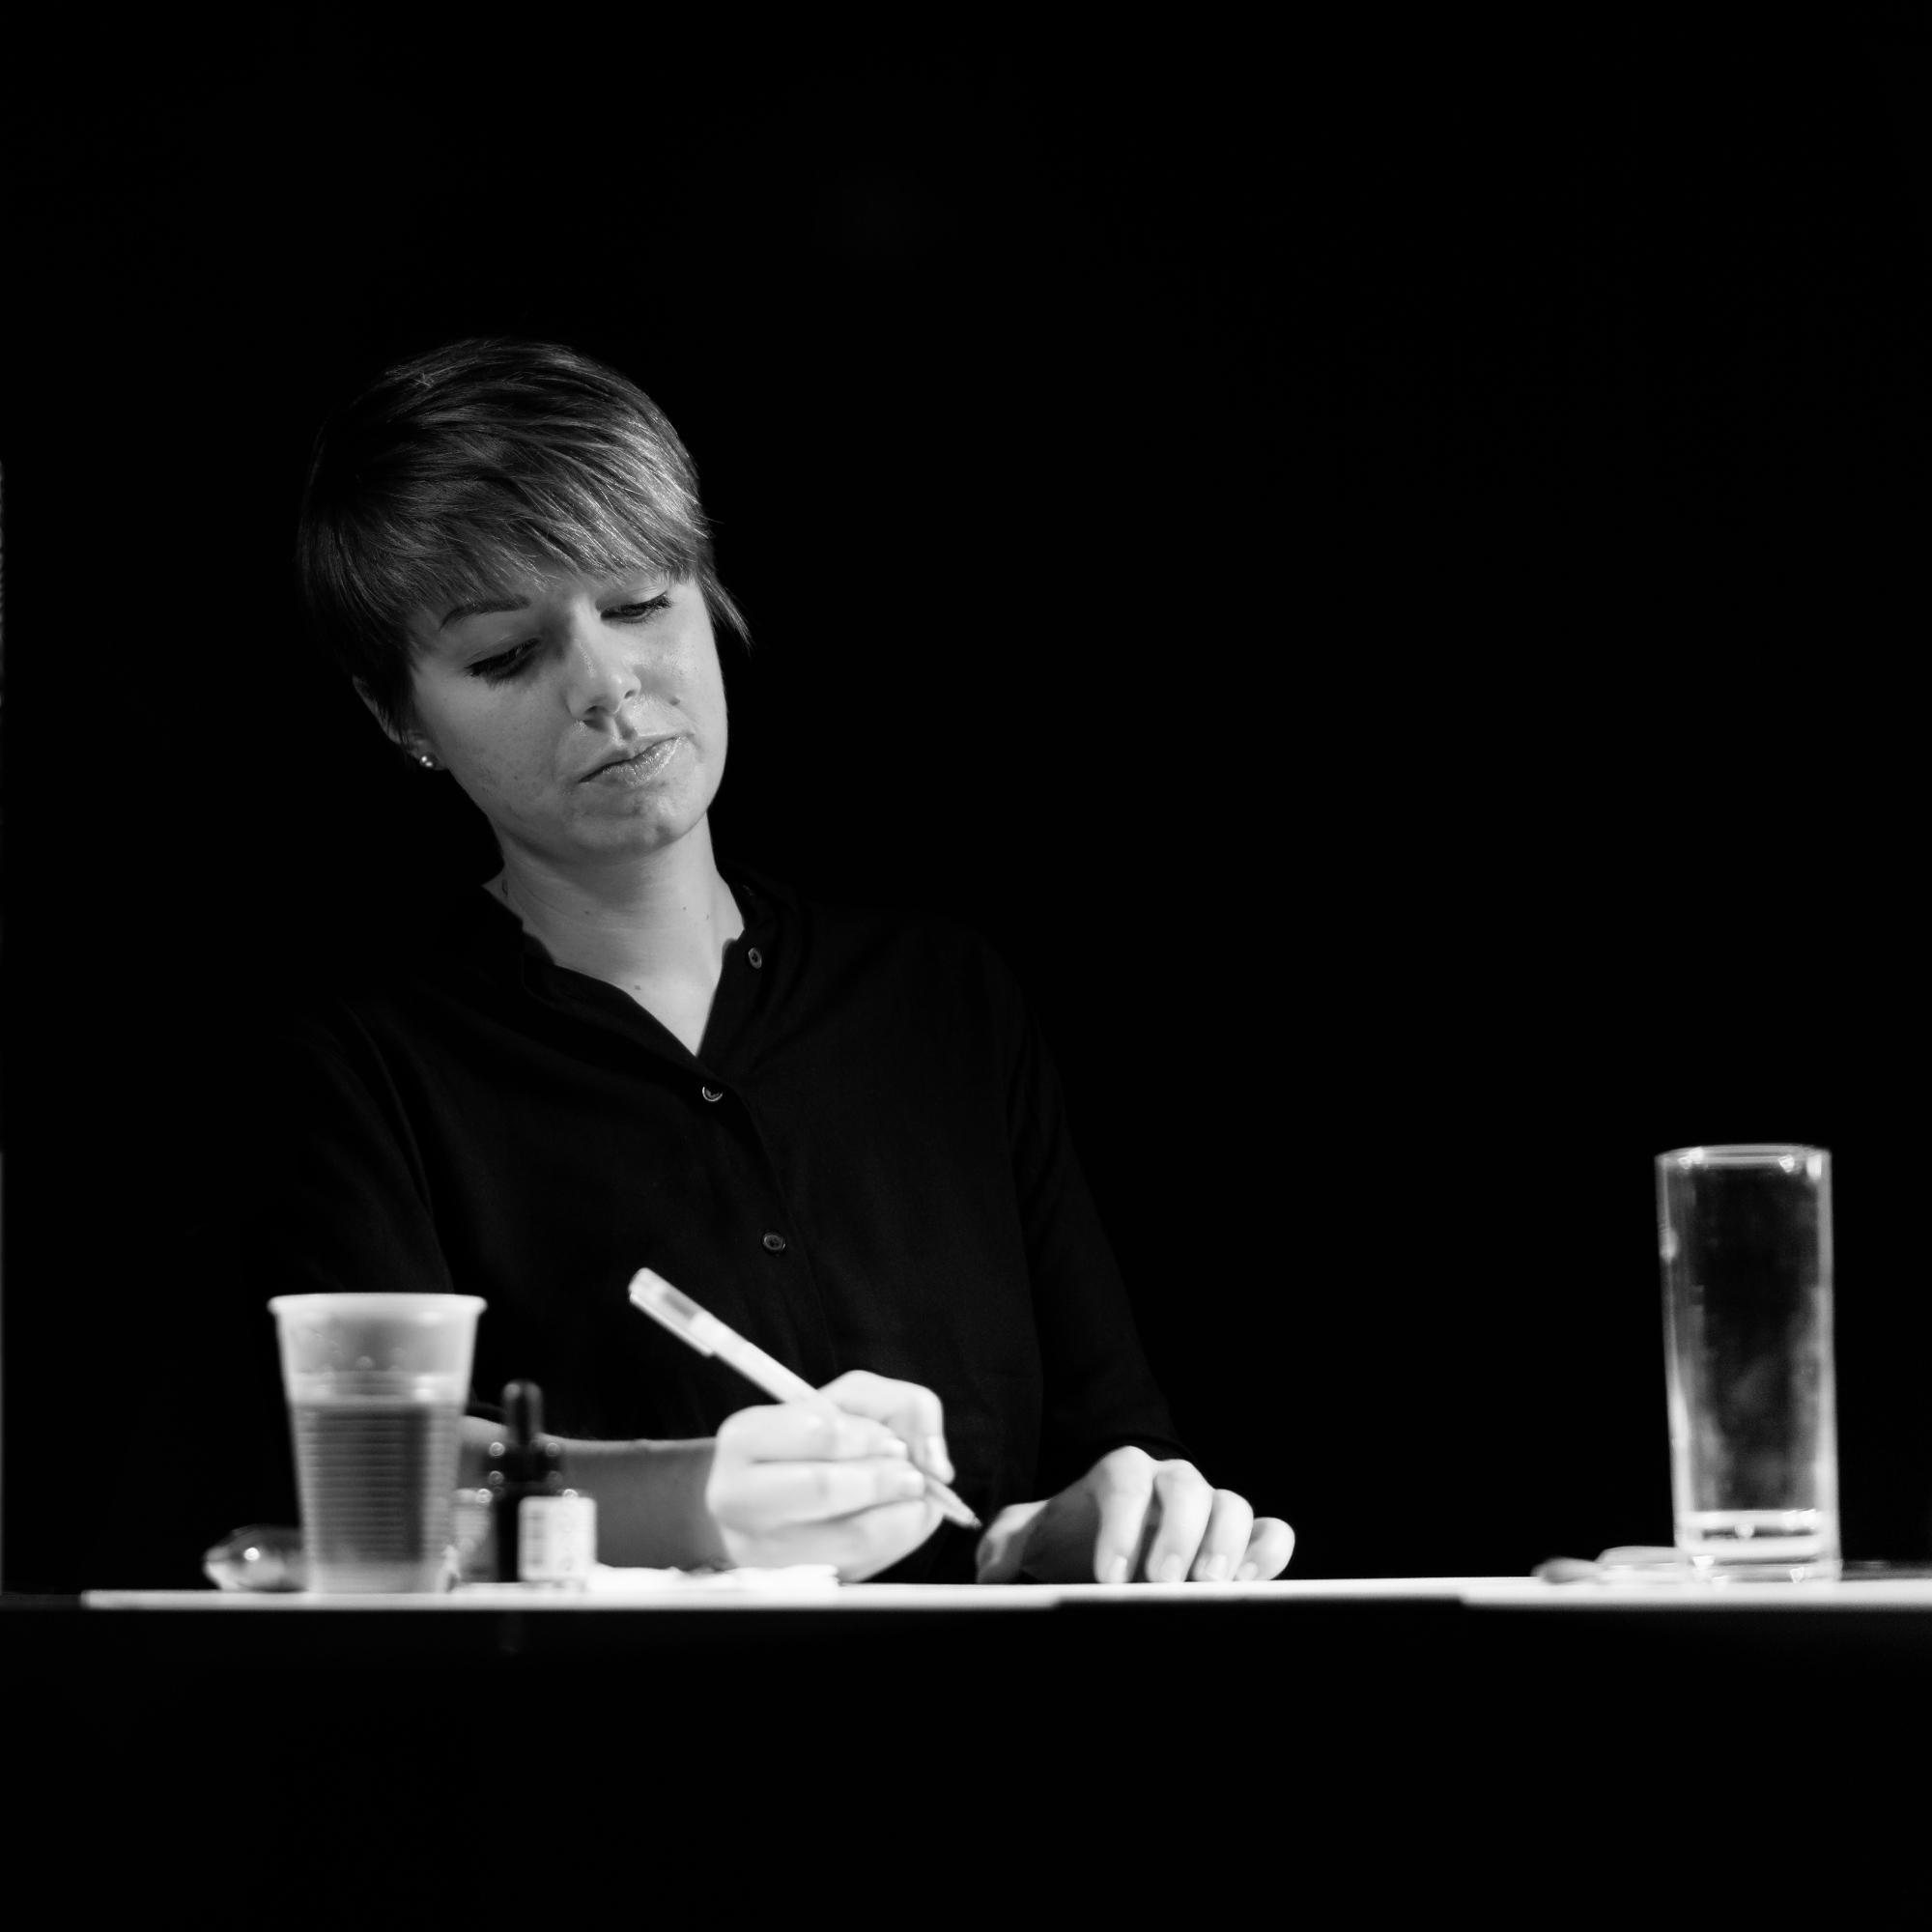 People work II Artist Hanna Wen - marcushammerschmitt   ello